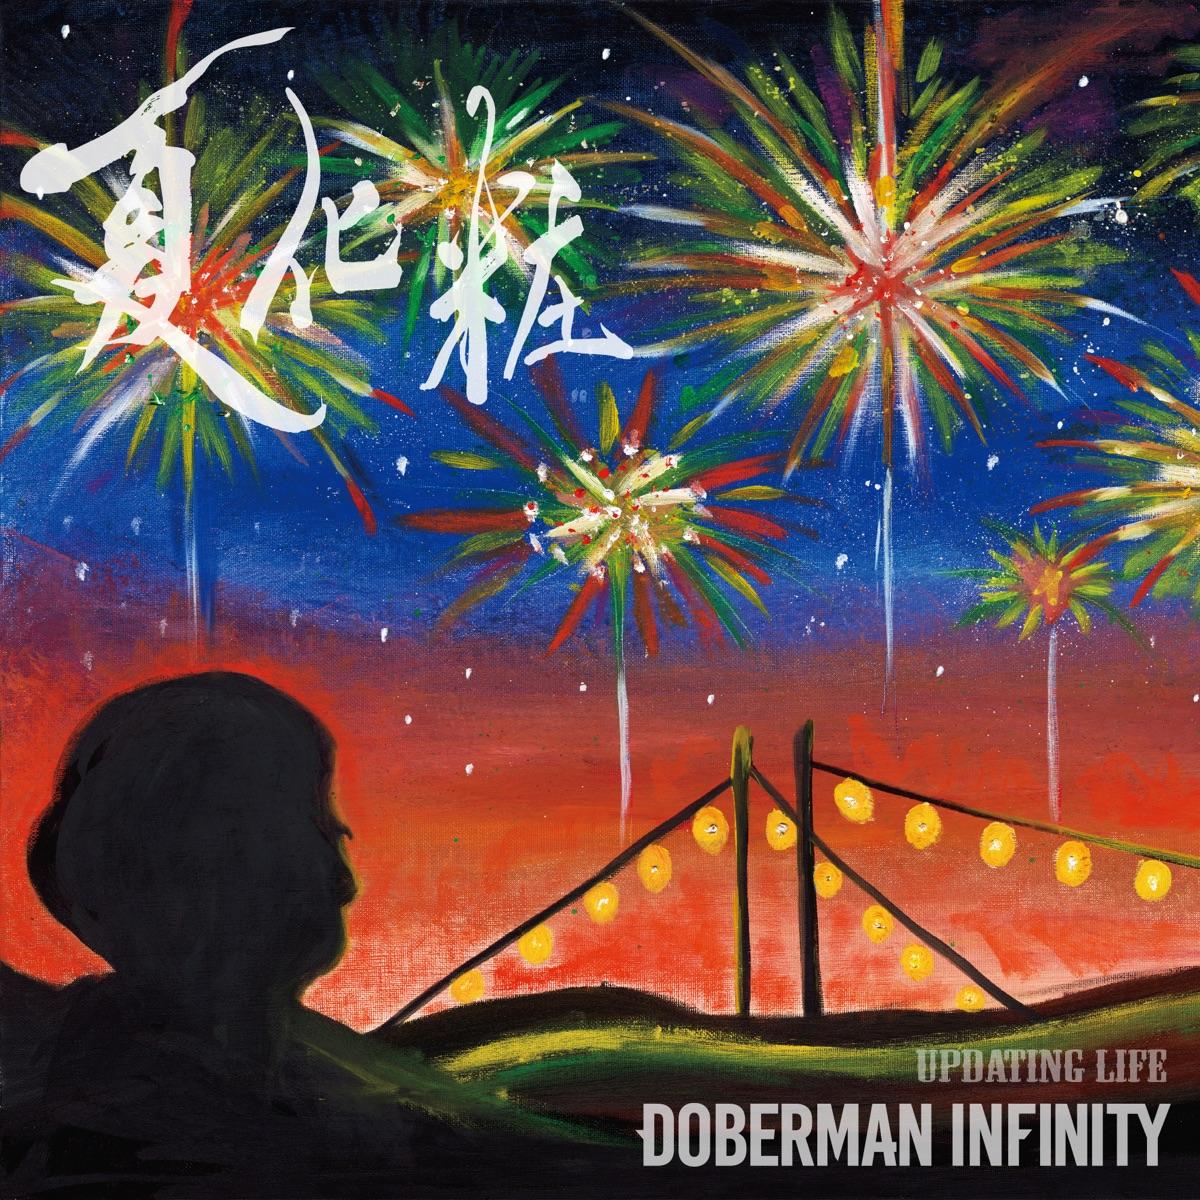 『DOBERMAN INFINITY - 夏化粧』収録の『夏化粧 / Updating Life』ジャケット